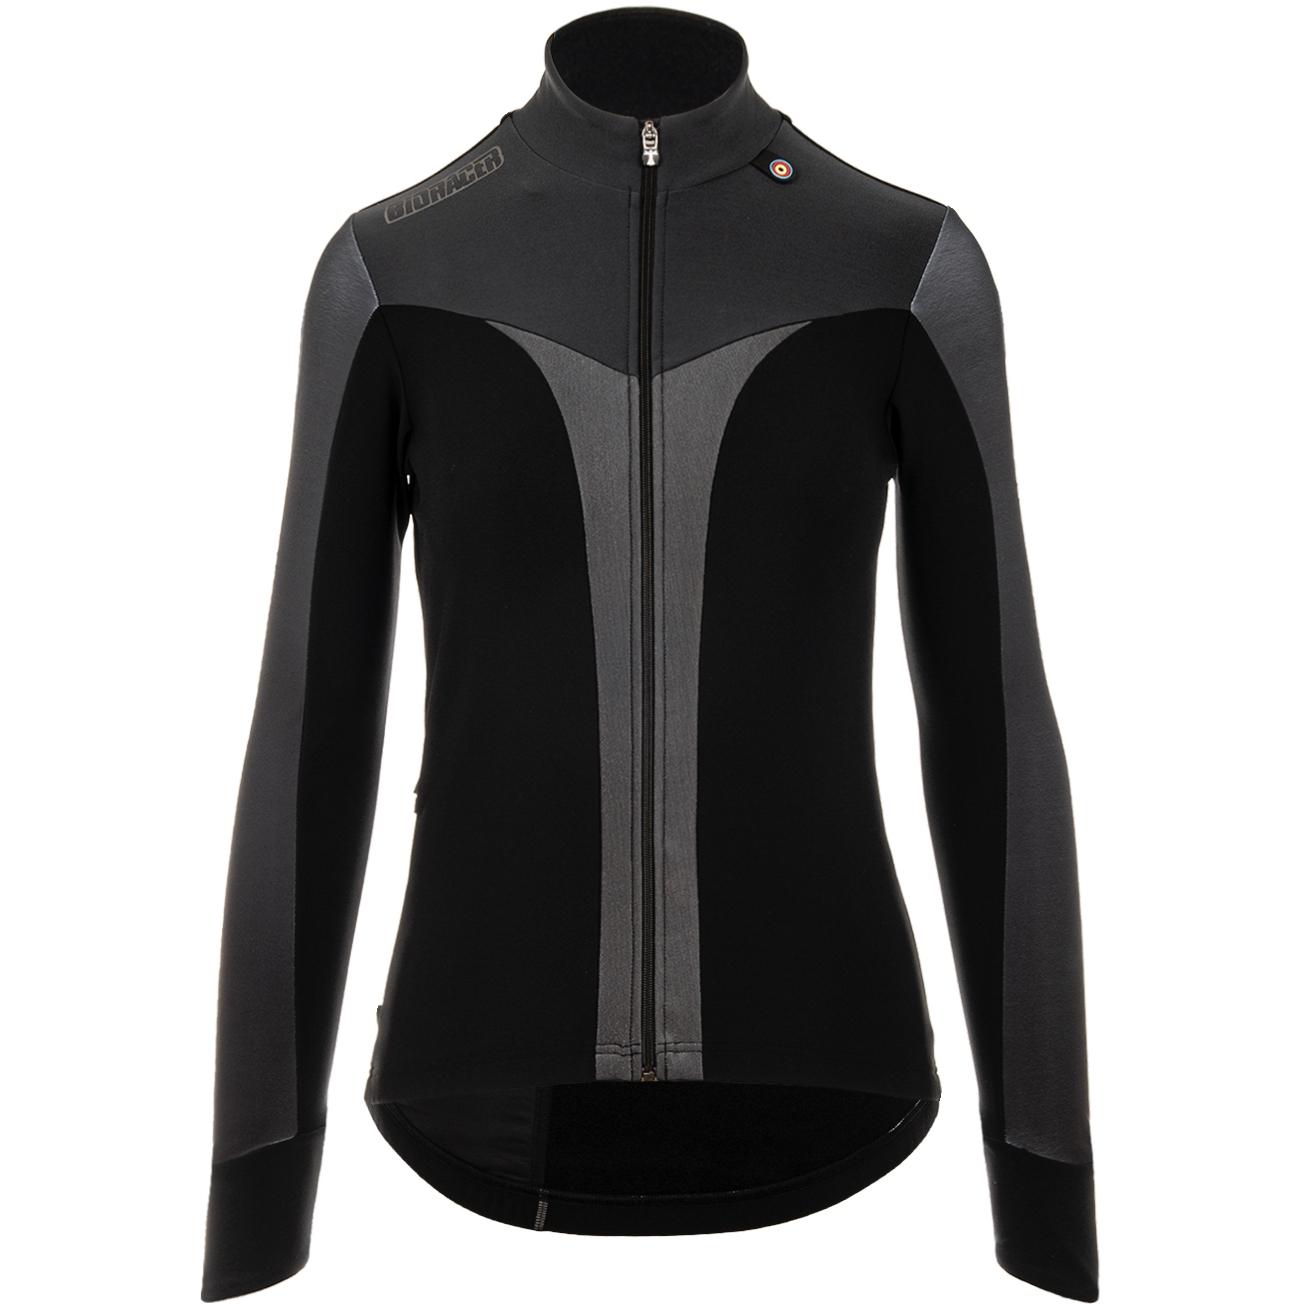 Bioracer Vesper Tempest Spring Jacket Women - black stone